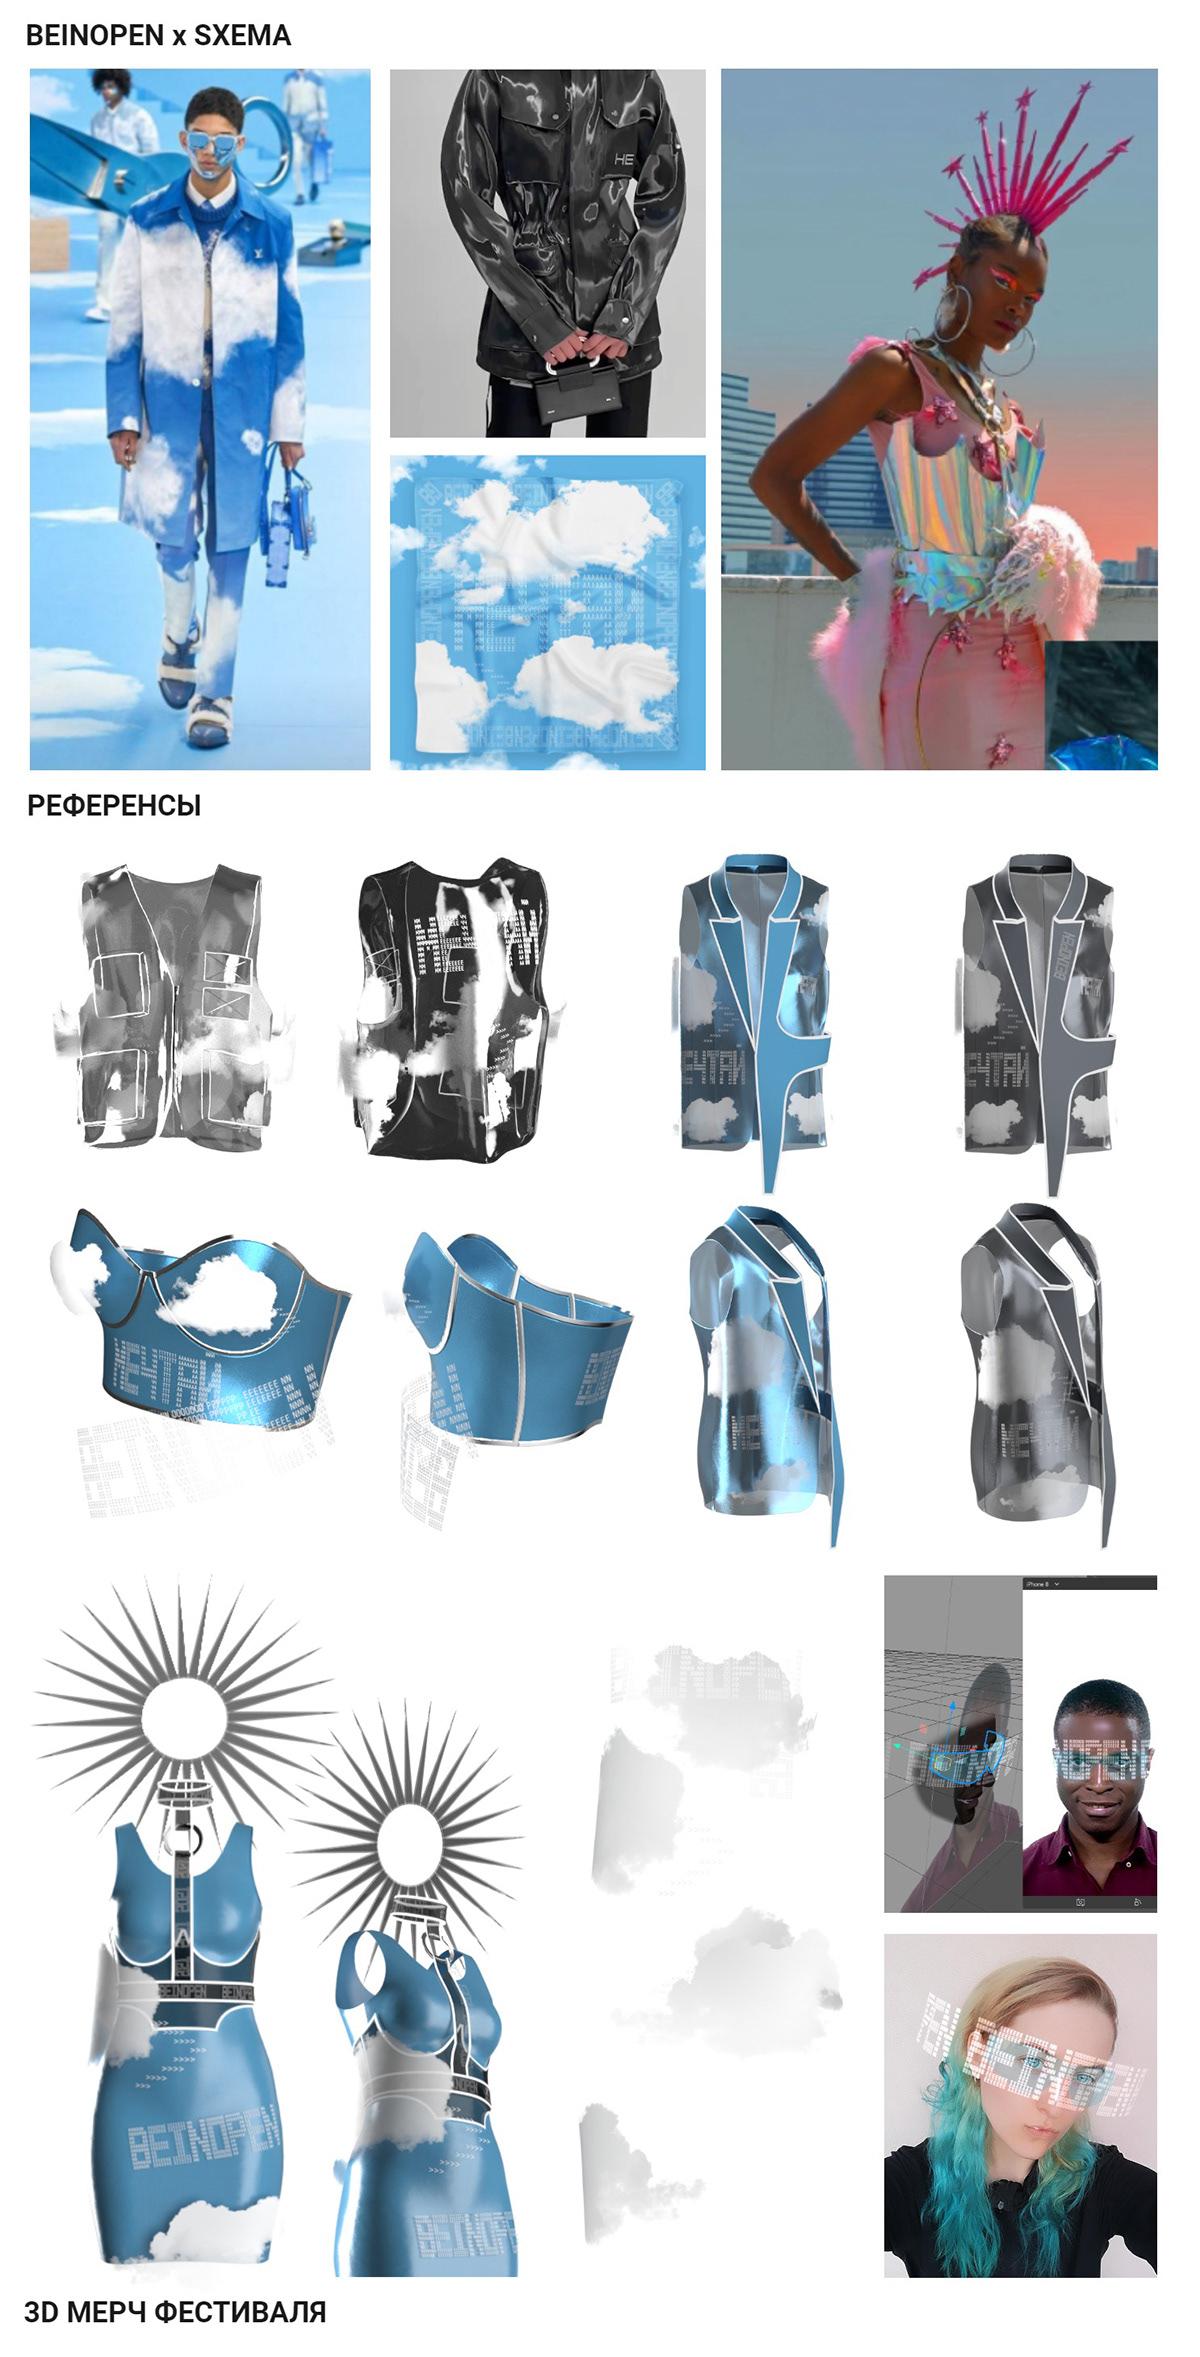 3D 3Dclo 3dclothing digitalclothing virtualfashion